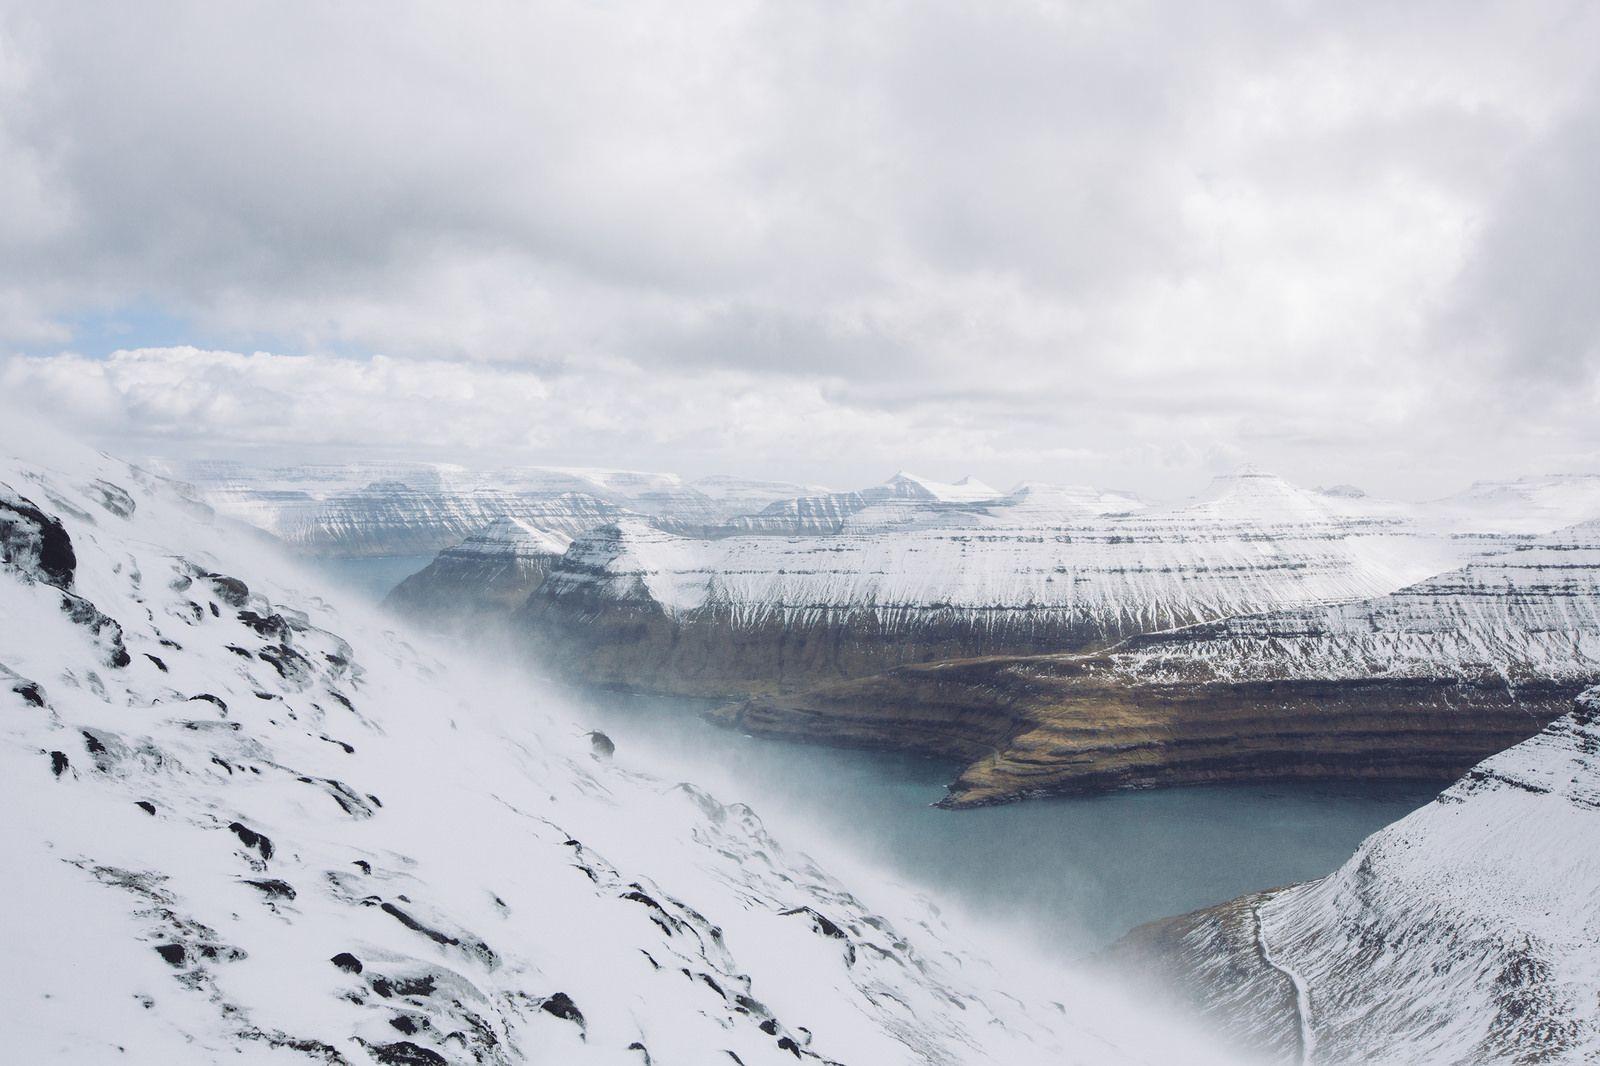 Slættaratindur, Faroe Islands, archipiélago de Dinamarca   photo by Simon Dubreuil https://flic.kr/p/sockaq